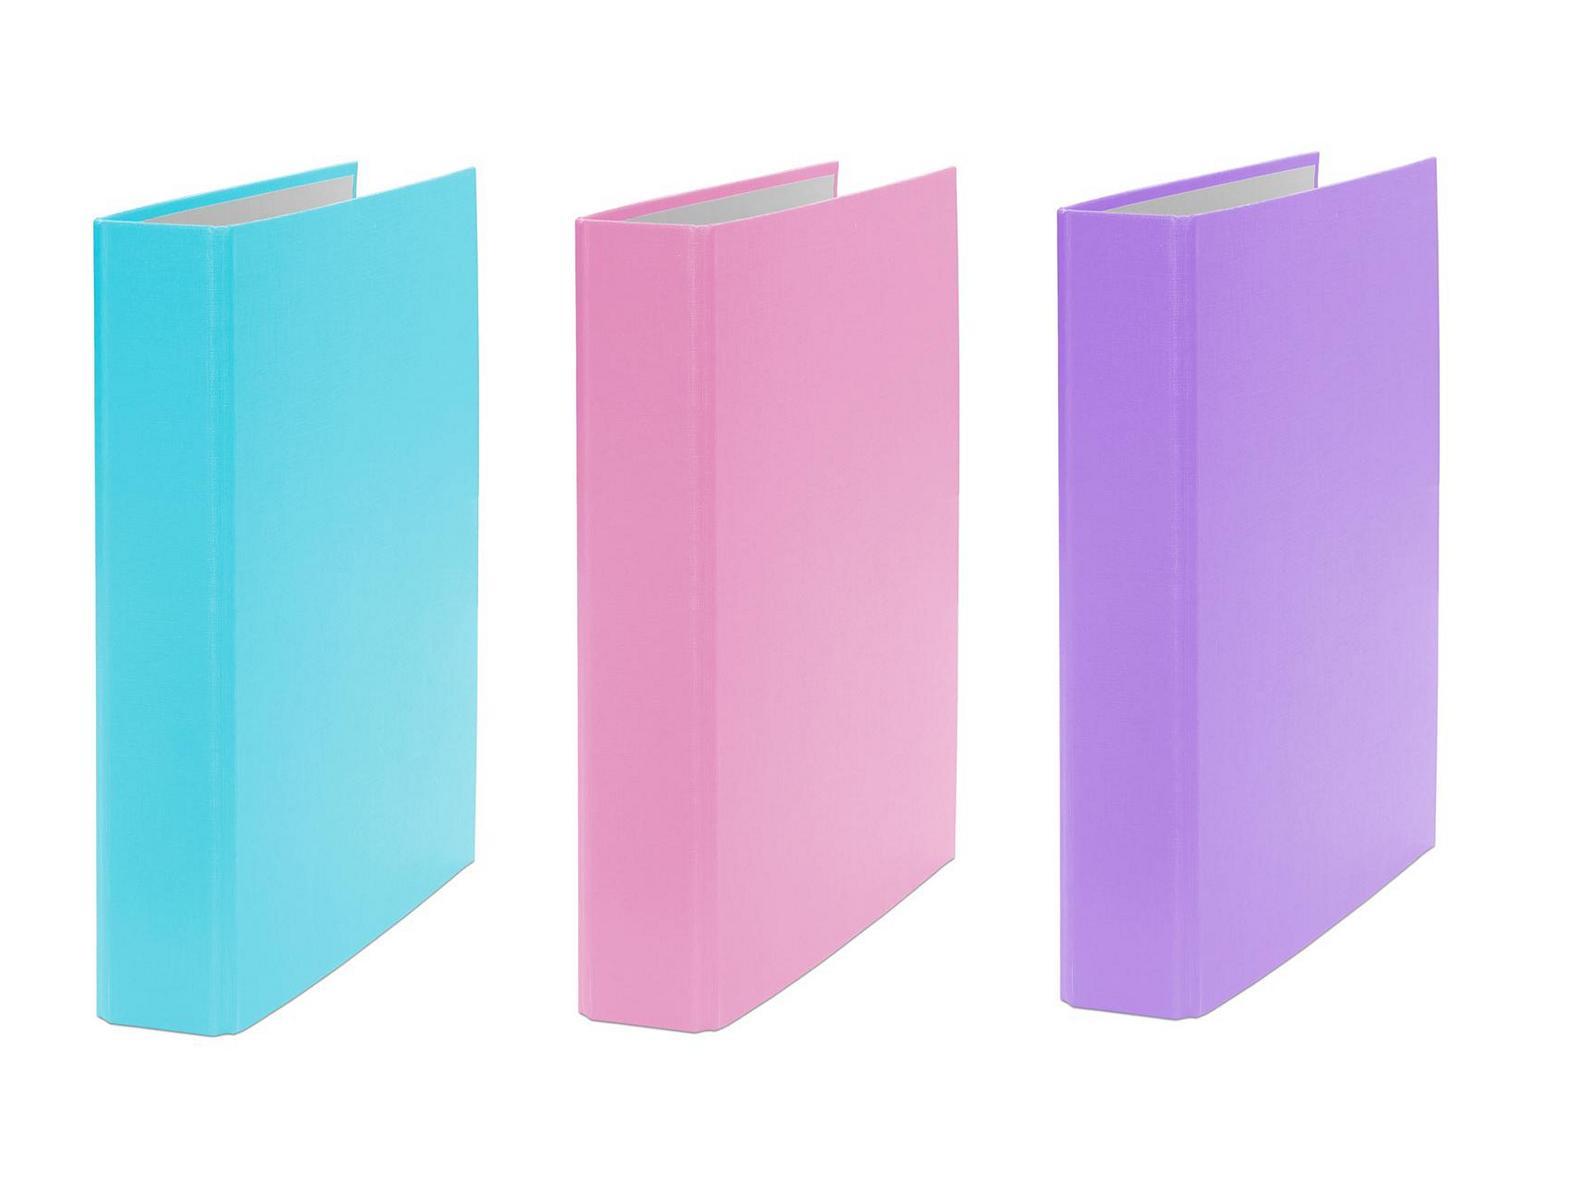 3x Ringbuch Din A5 2 Ring Ordner Farbe Je 1x Turkis Pink Und